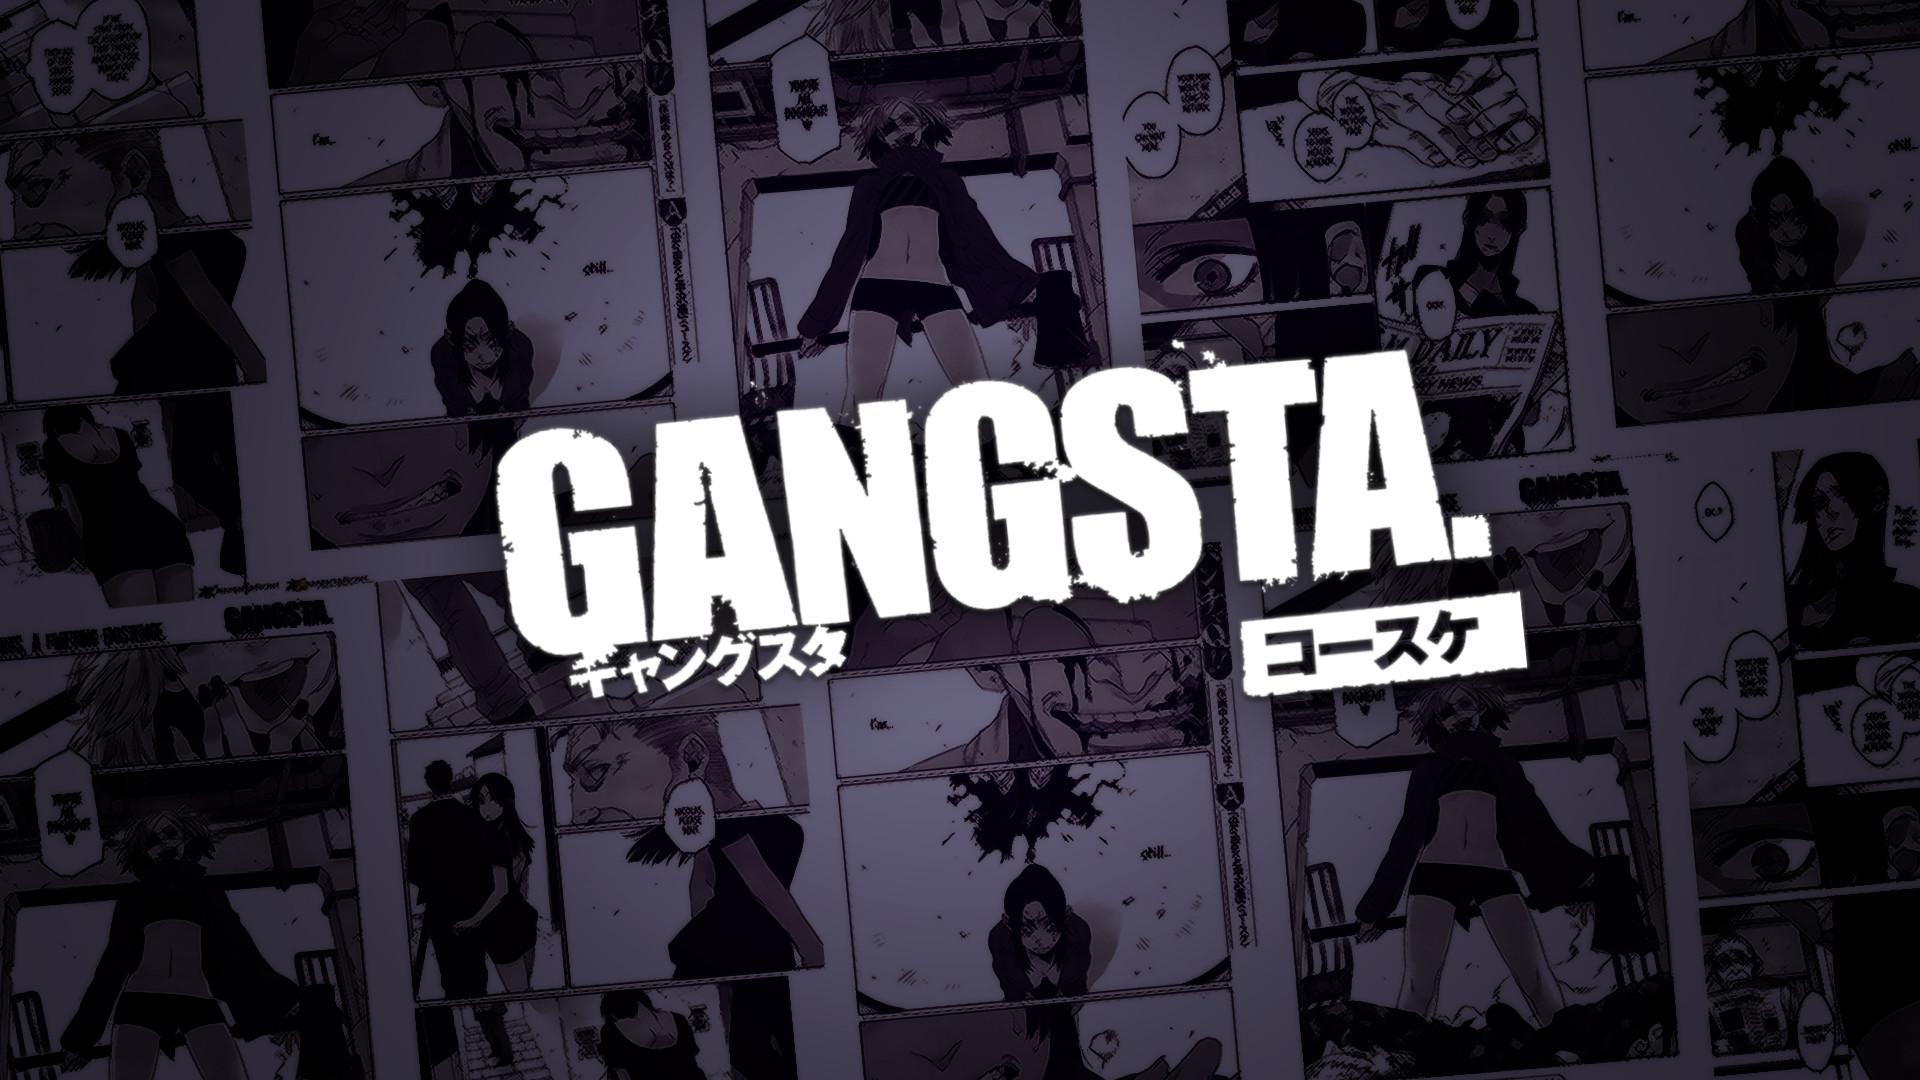 Res: 1920x1080, Anime Gangsta. Wallpaper